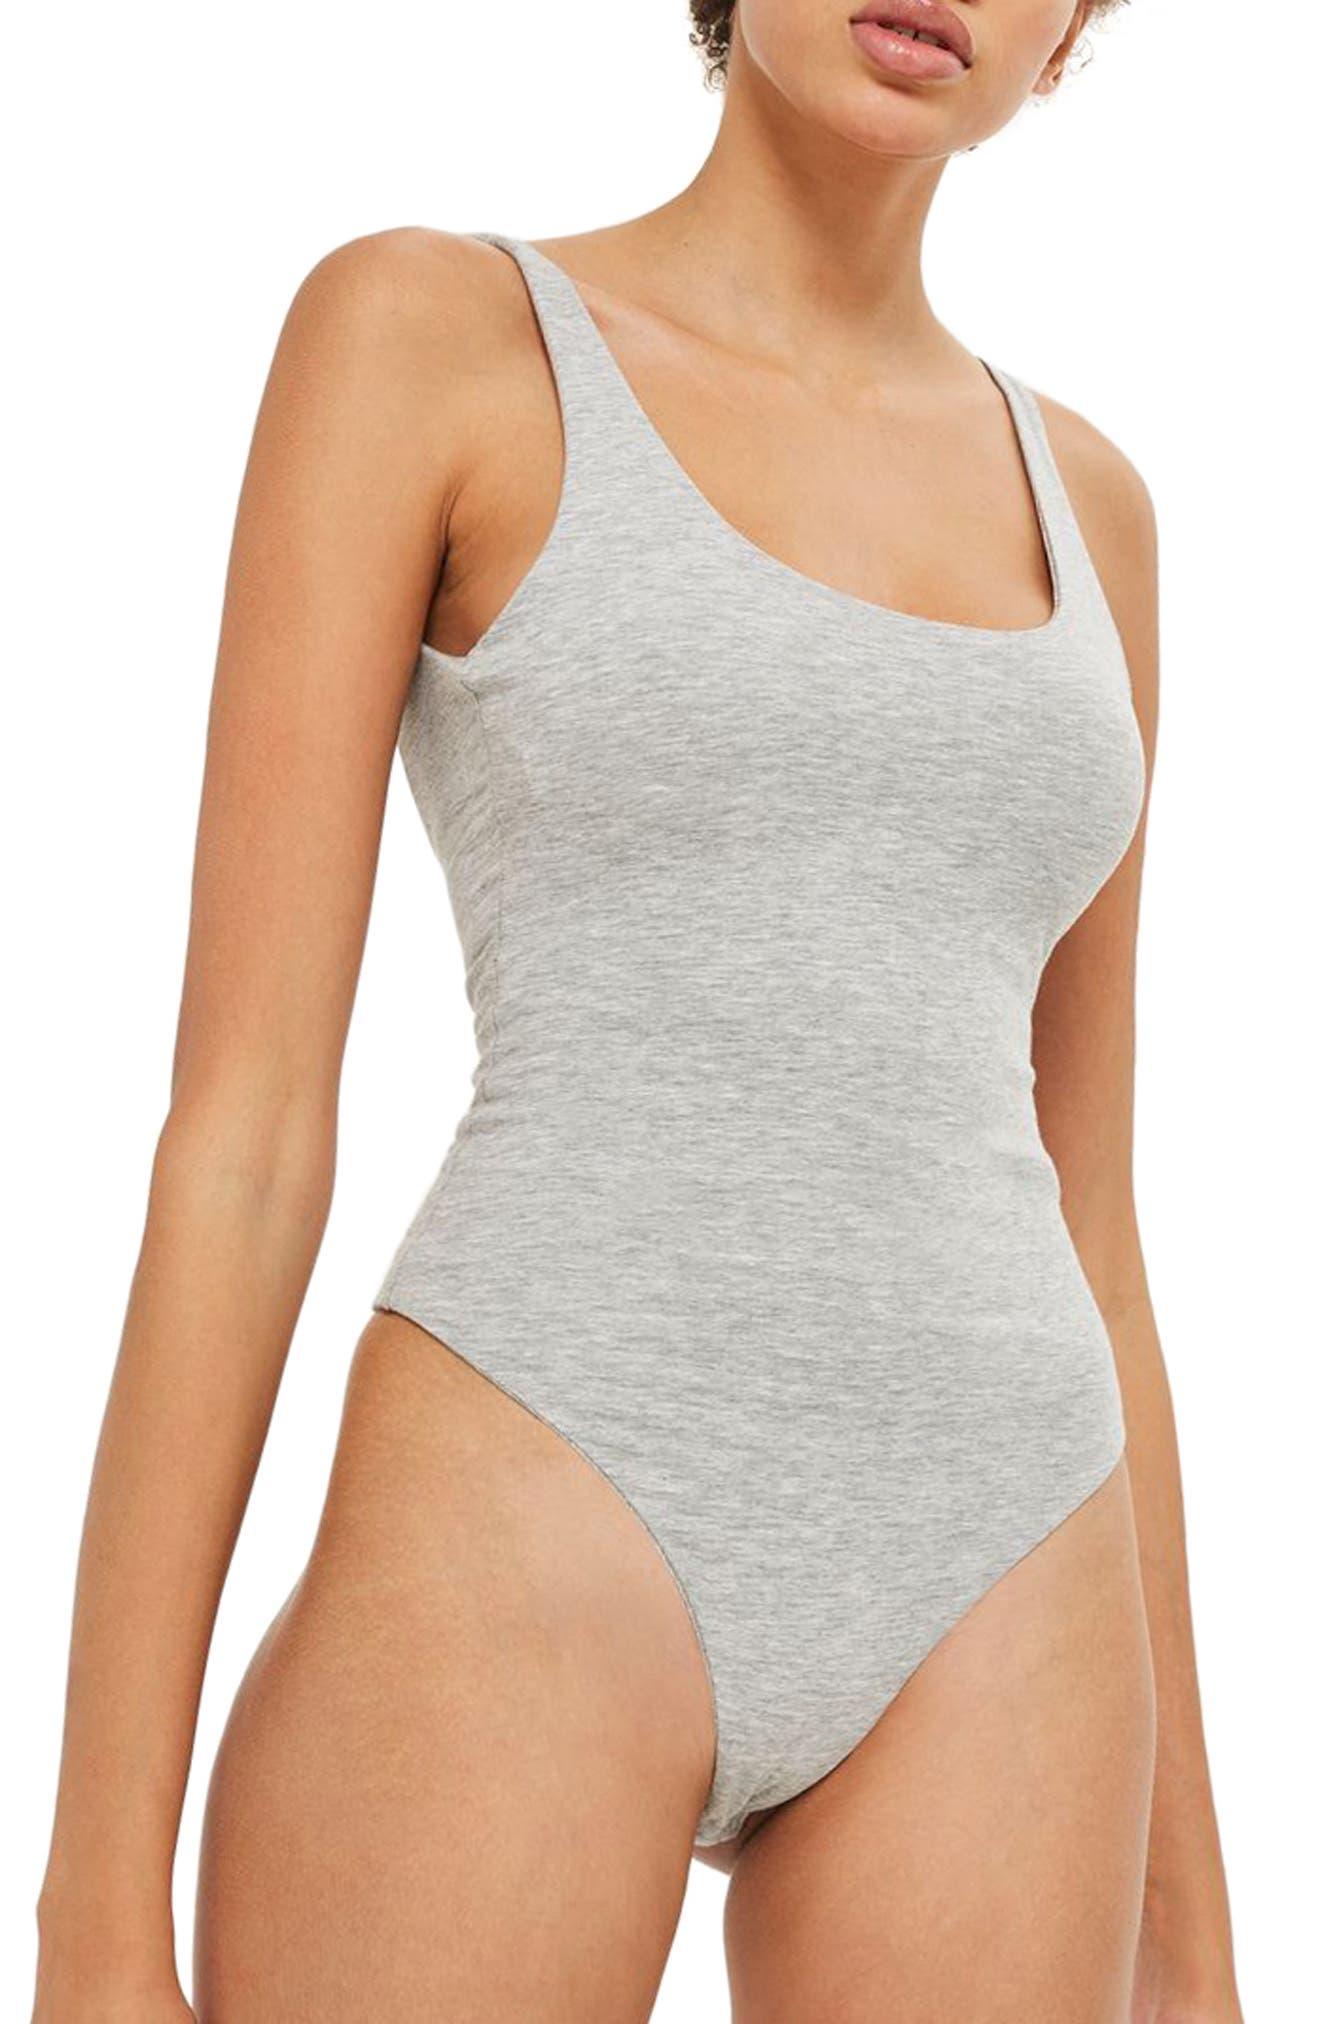 Main Image - Topshop Scoop Back Thong Bodysuit